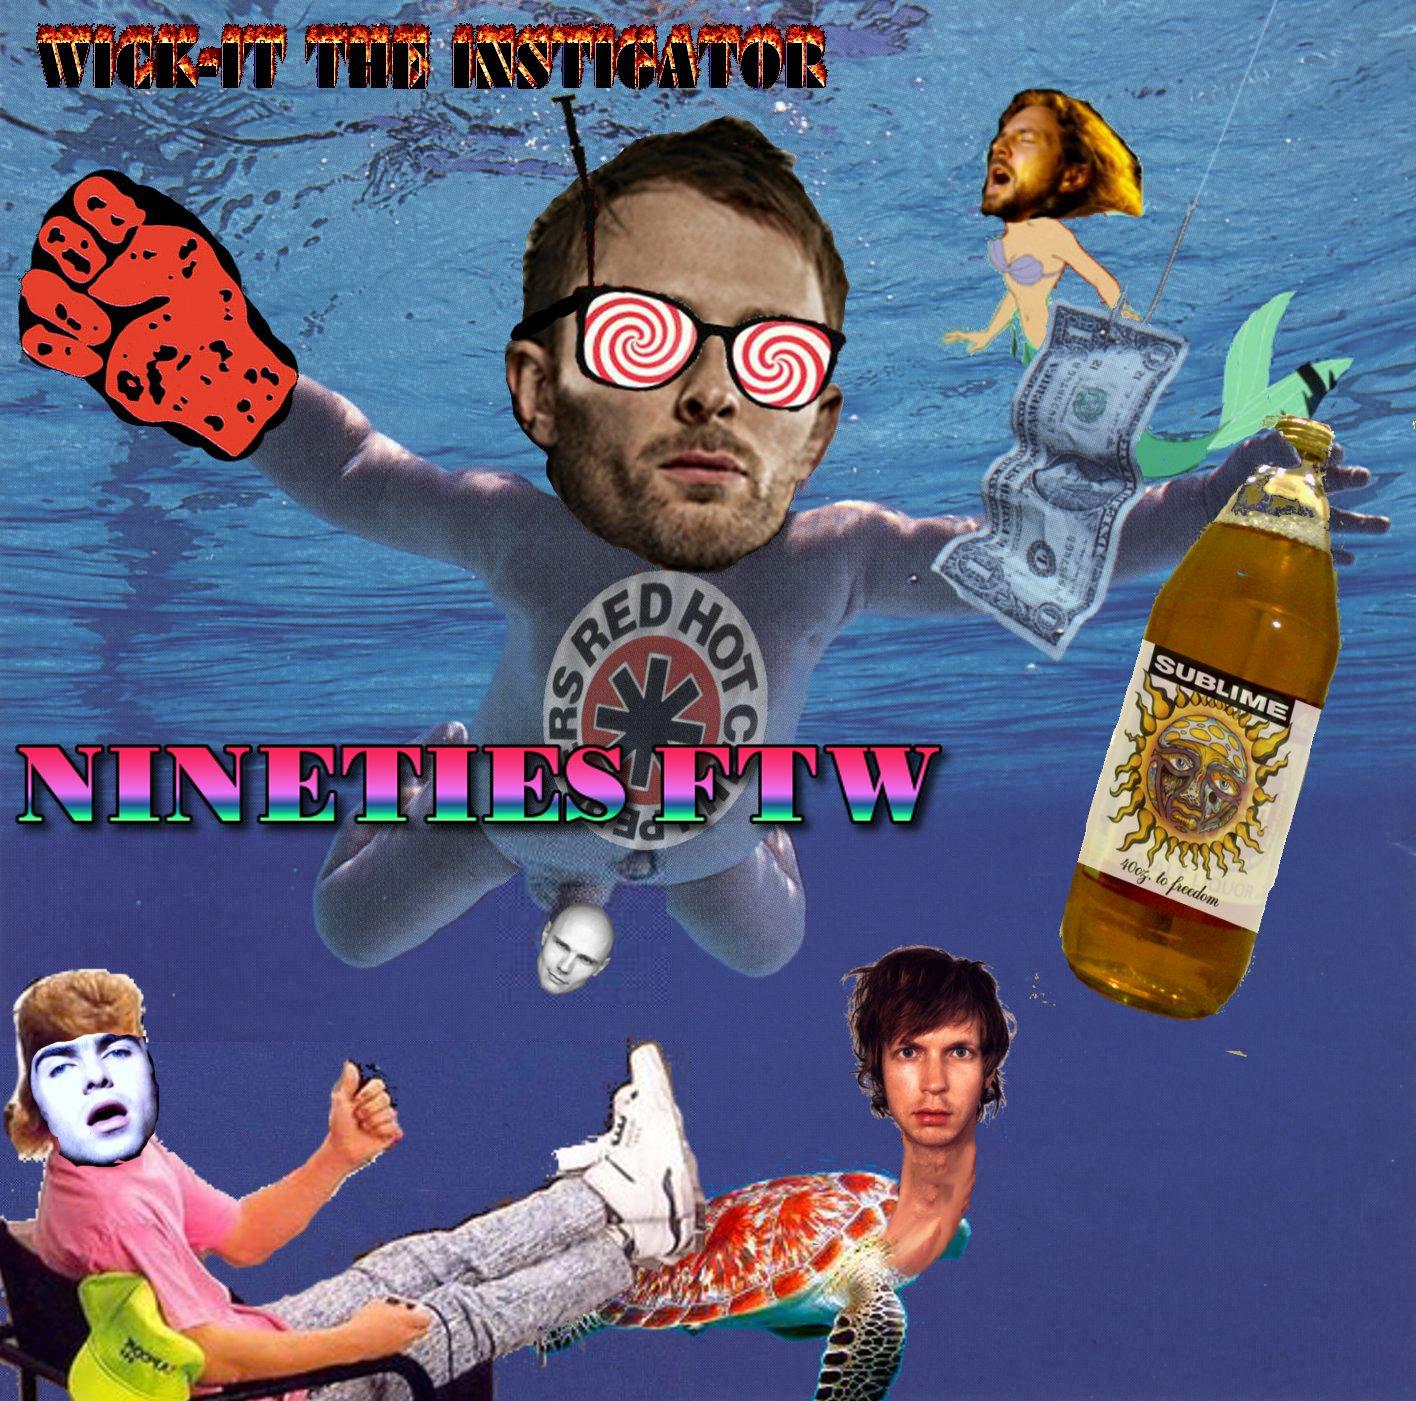 Nineties FTW (Wick-it's 90's Rock Nostalgia Overdose Mashup) – By Wick-it the Instigator